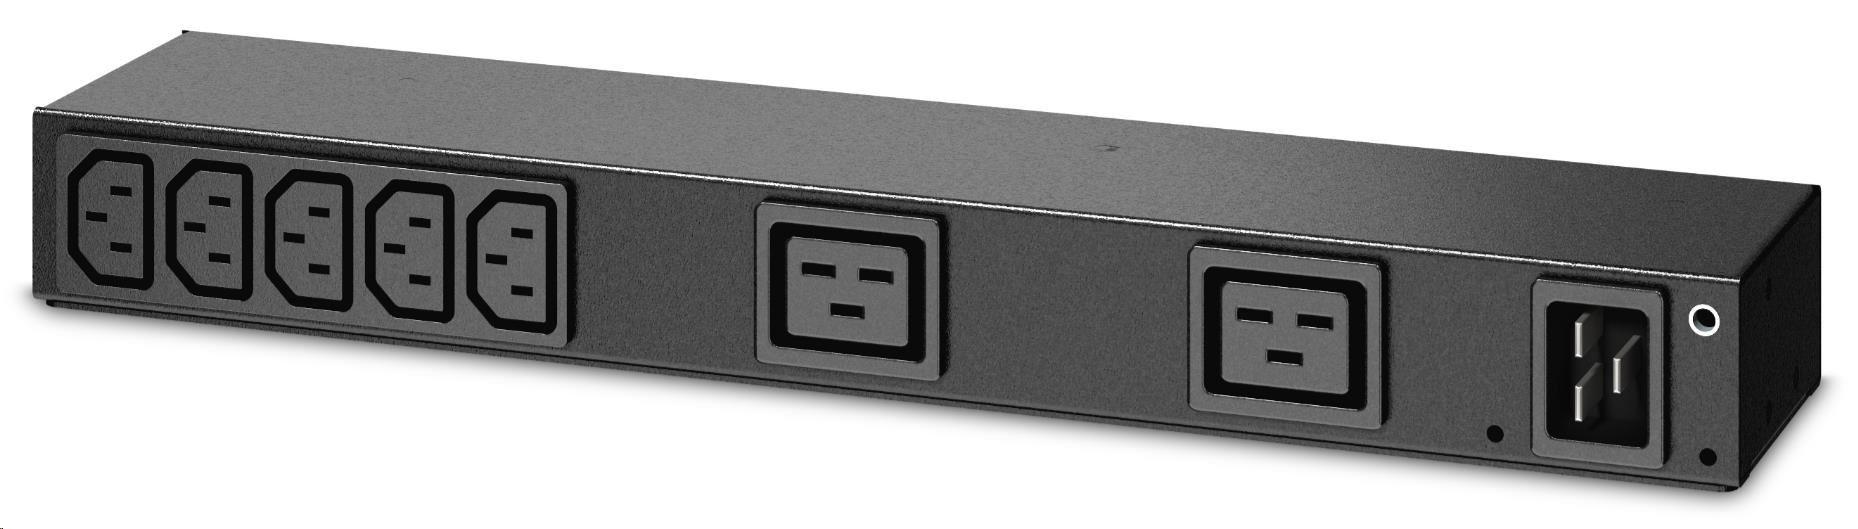 APC Rack PDU, Basic, 0U/1U, 100-240V/20A, 220-240V/16A, (7) C13, (2) C19, IEC-320 C20